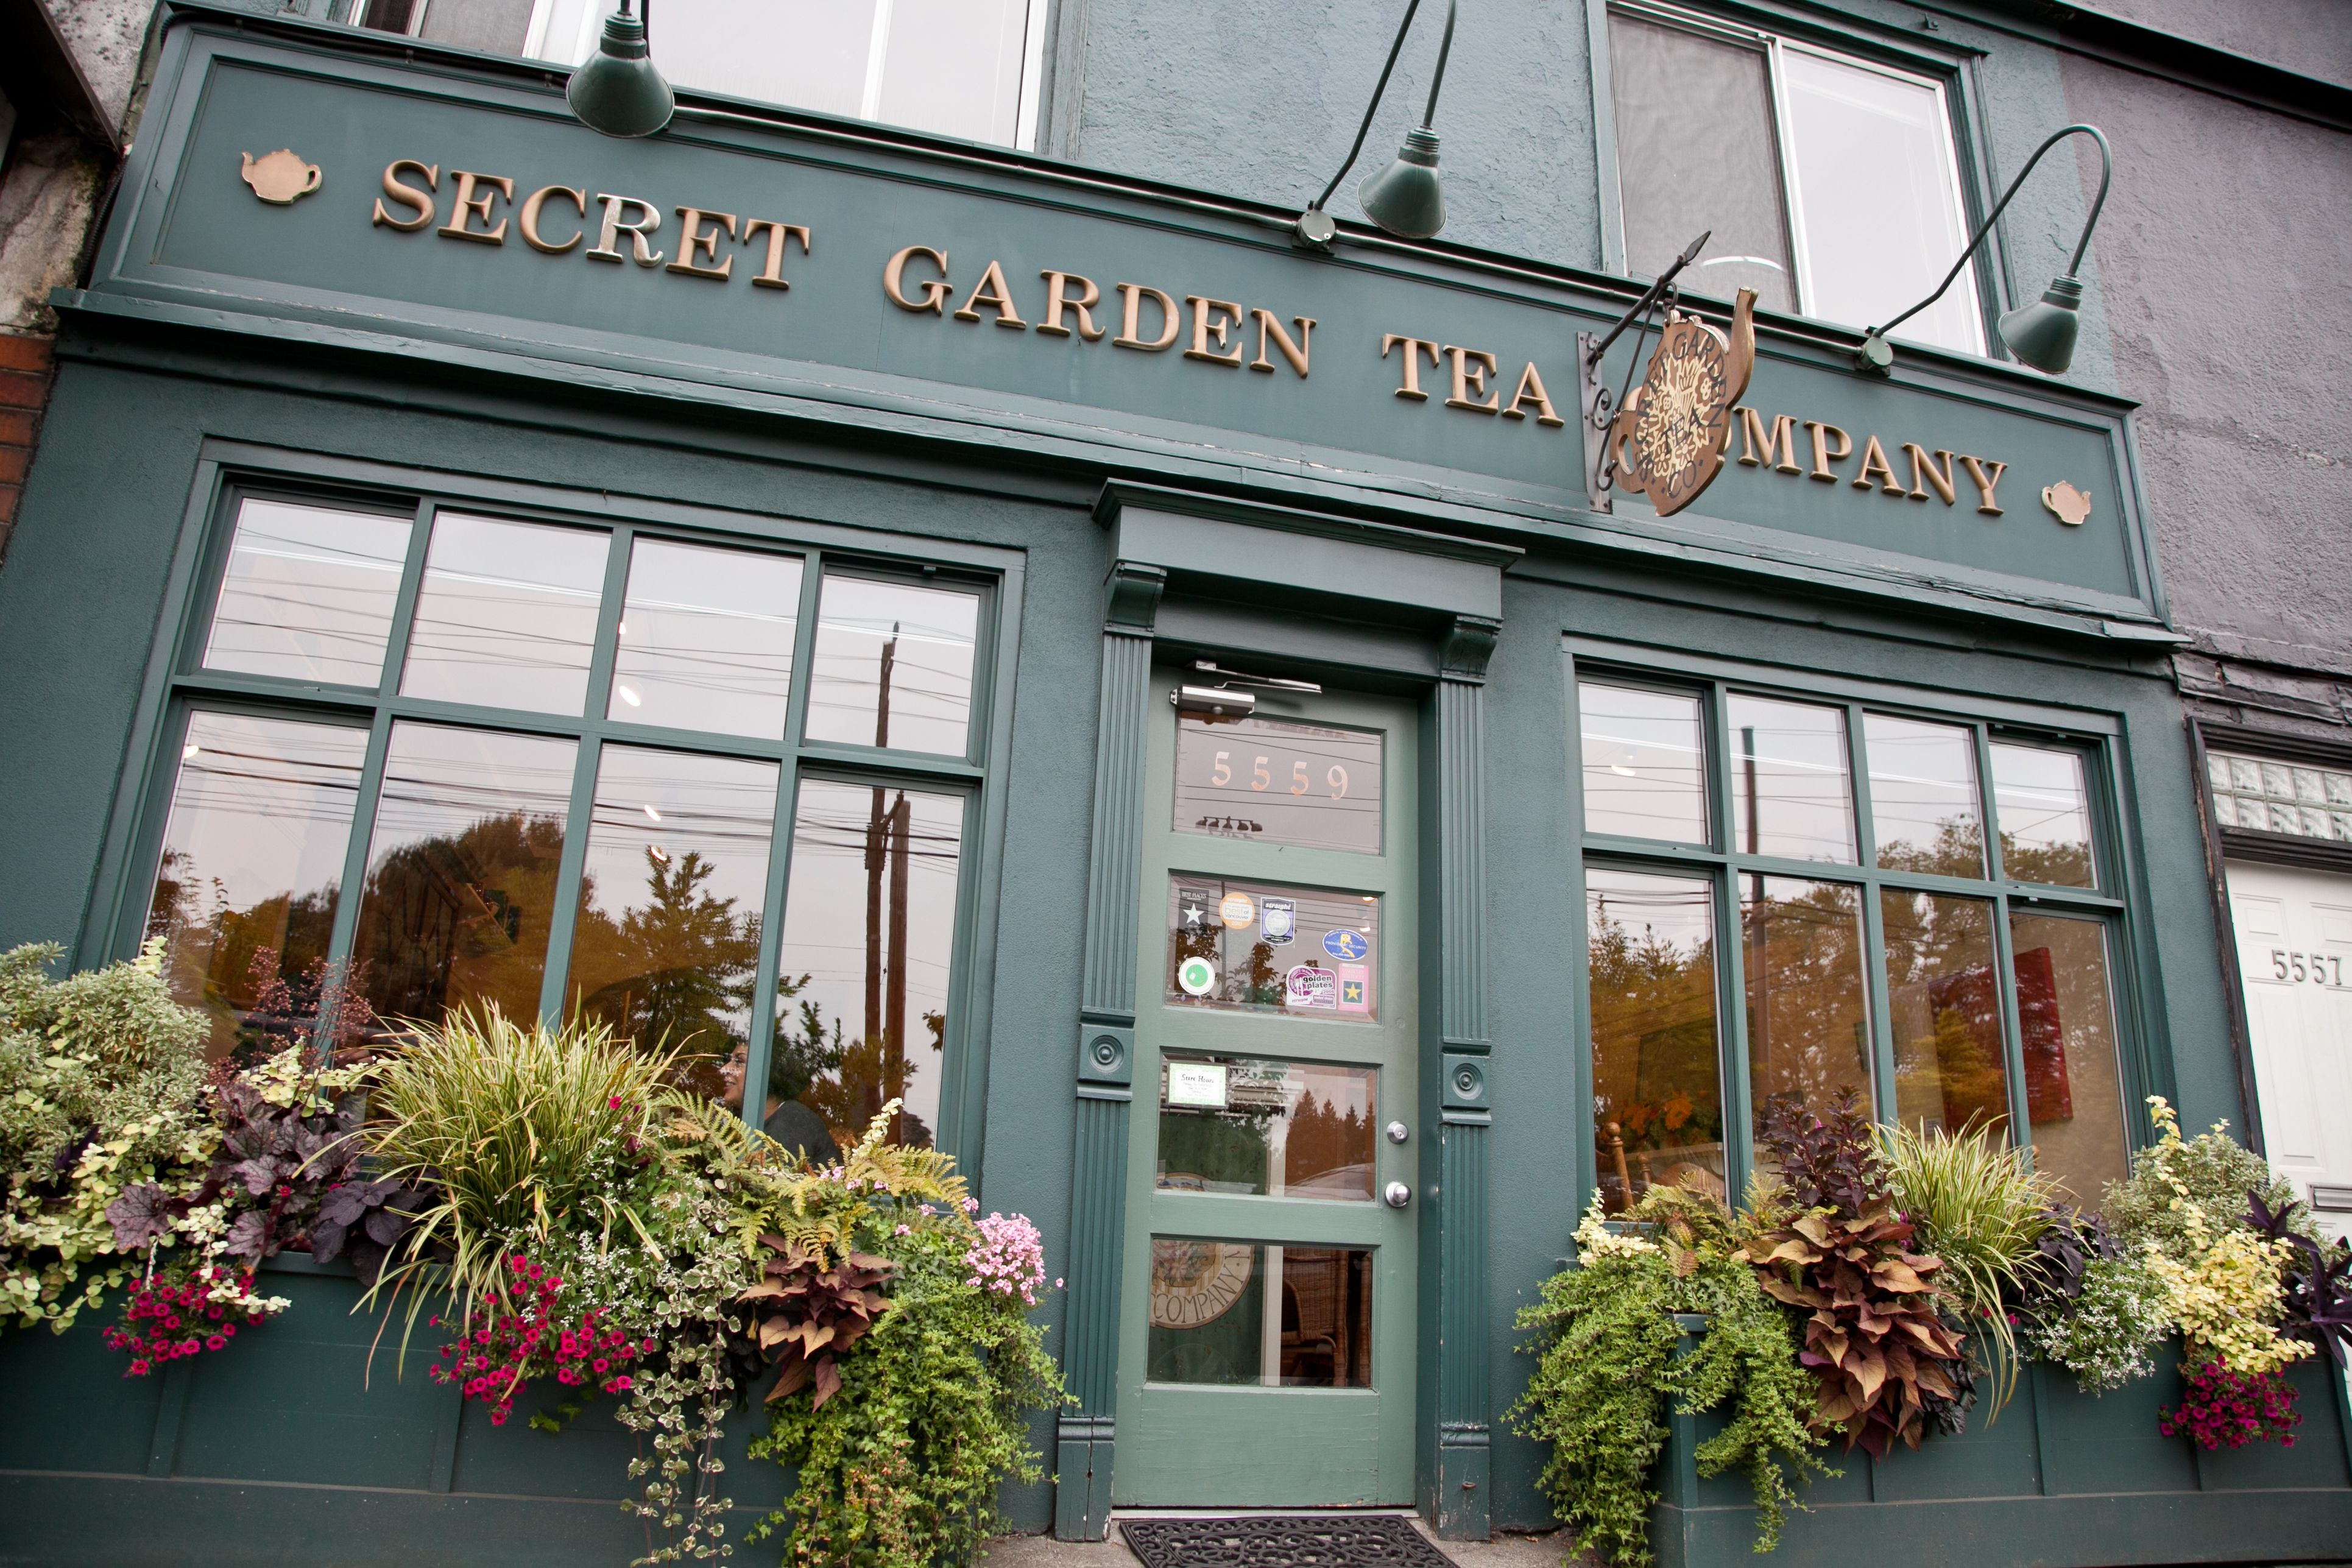 Visit   Secret Garden Tea Company